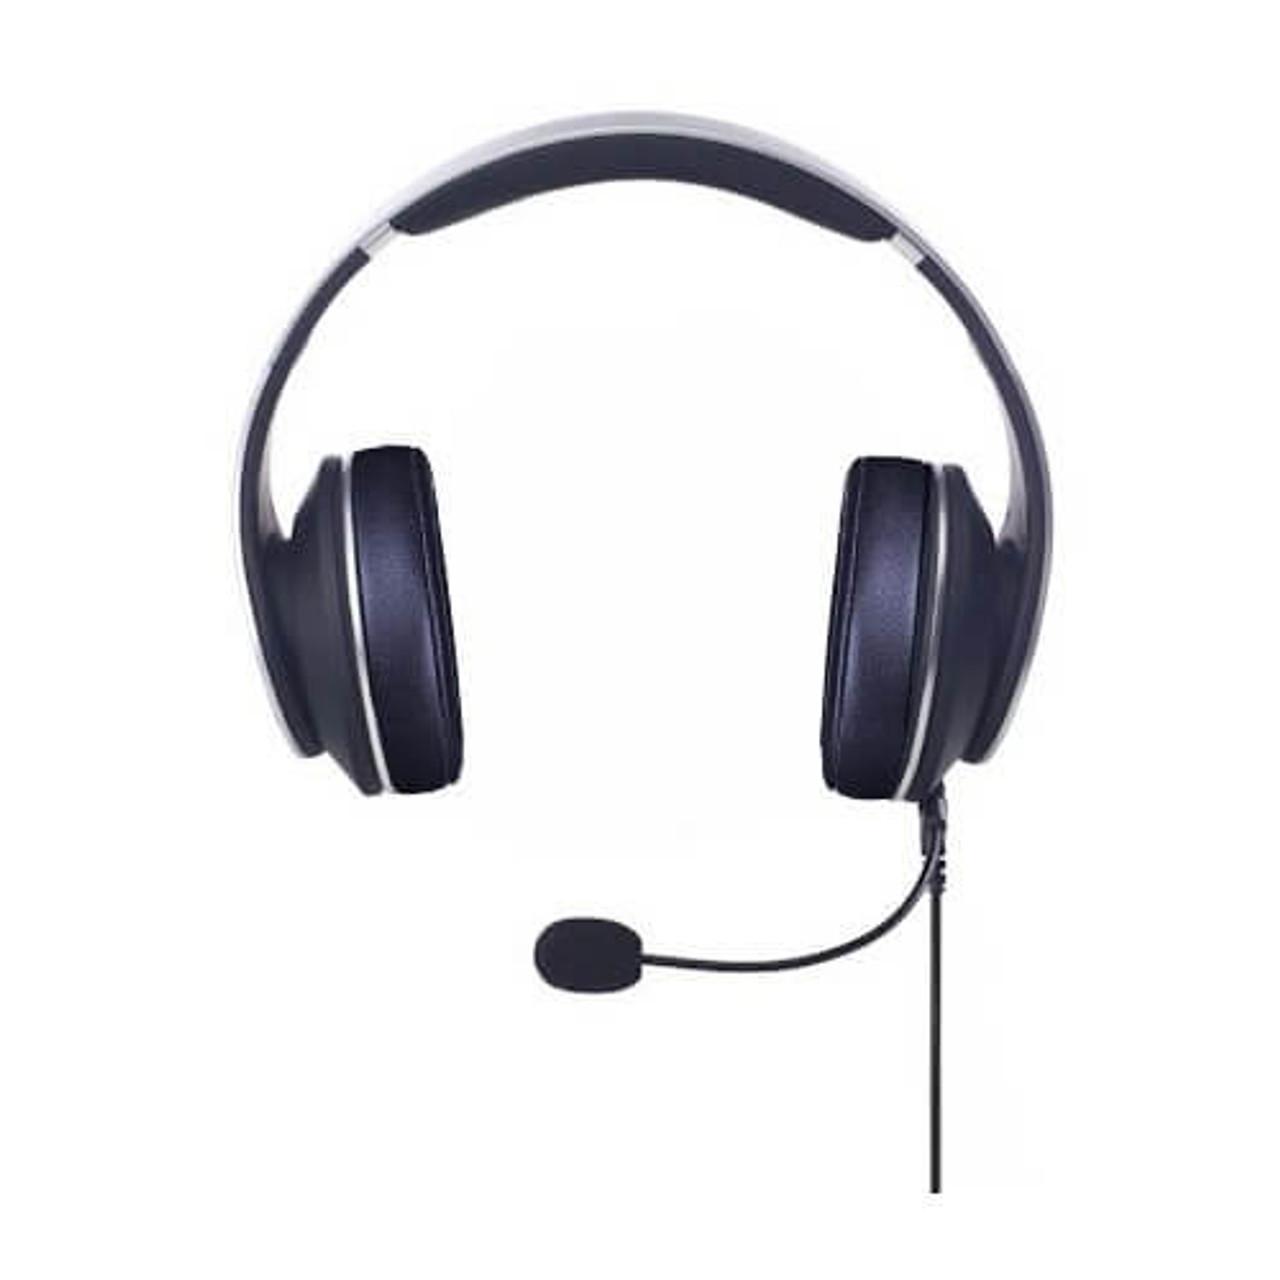 Beats Microphone Boom Mic For Headphones Mic For Beats